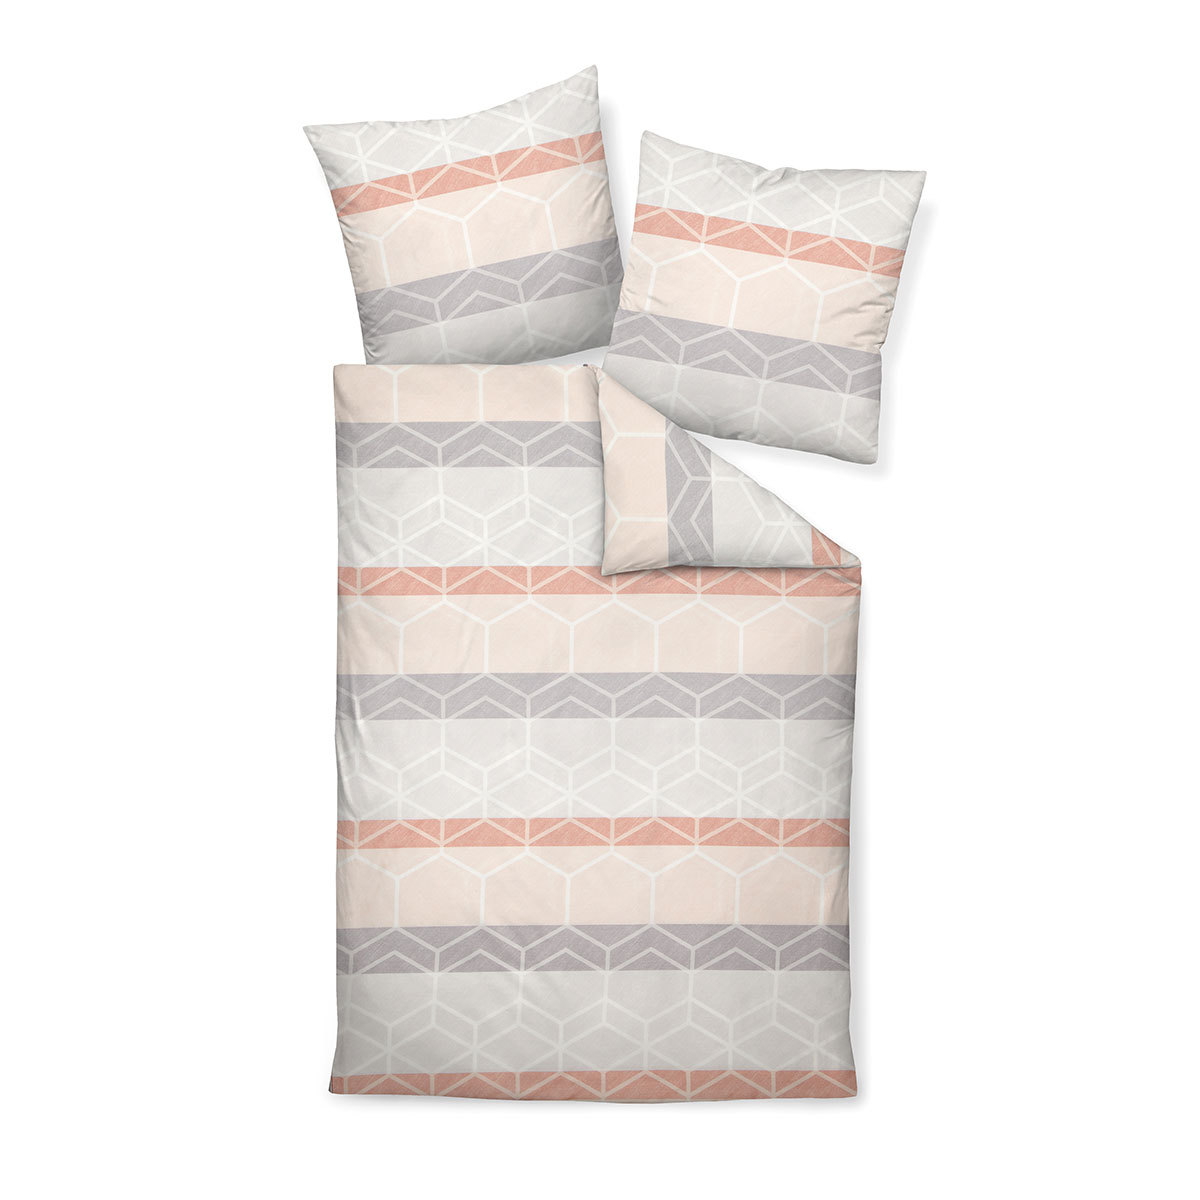 janine mako satin bettw sche moments 98017 01 g nstig. Black Bedroom Furniture Sets. Home Design Ideas